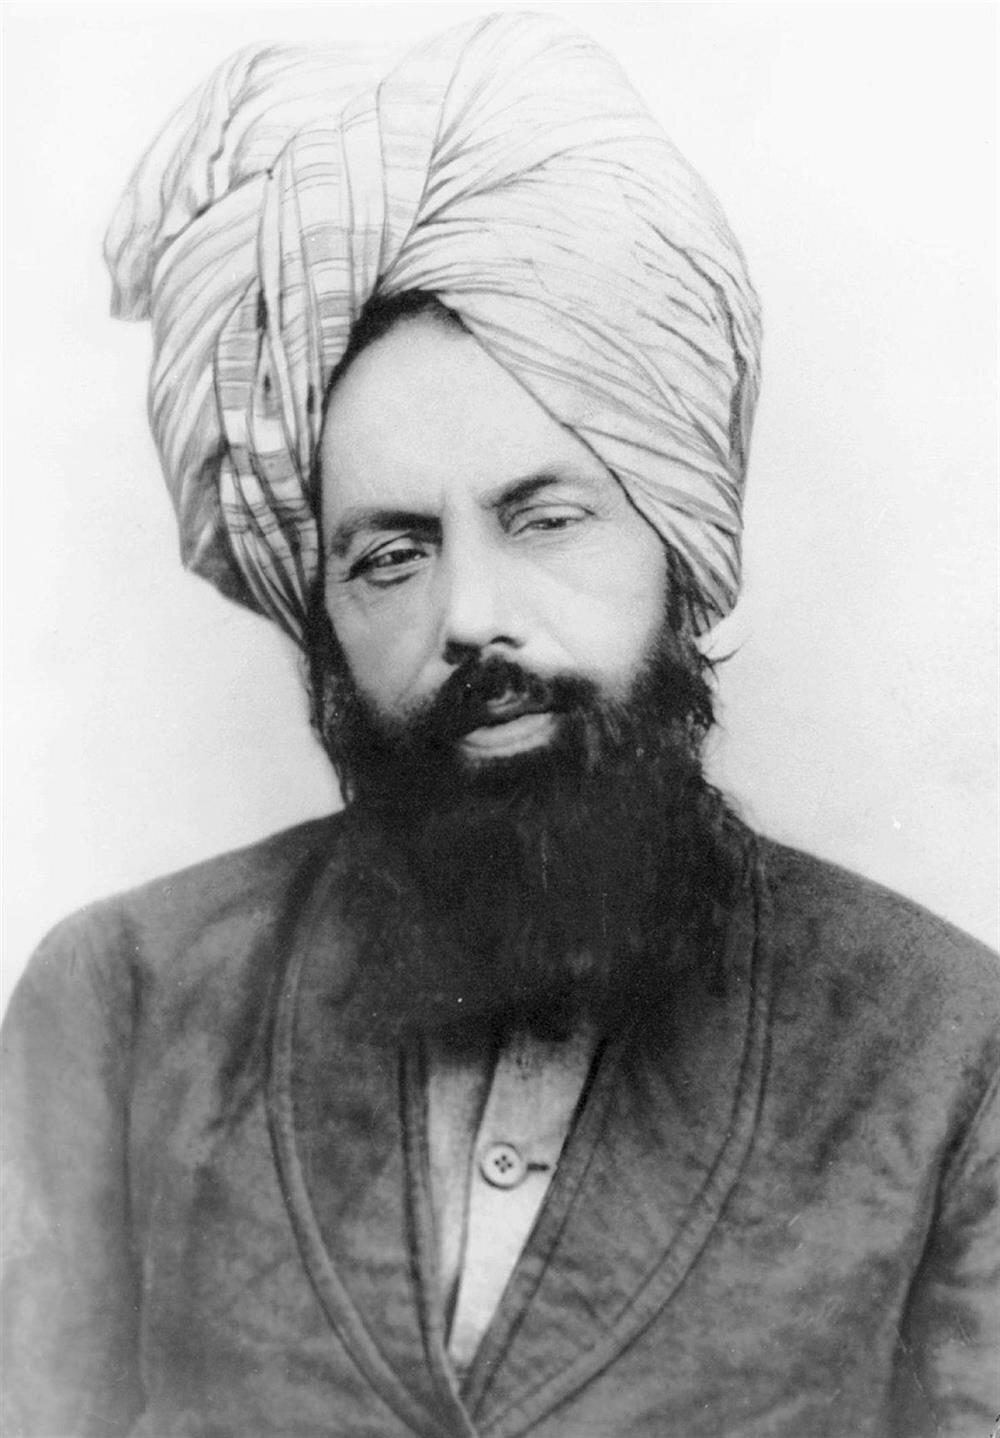 Ahmedilik'in kurucusu Mirza Gulam Ahmed Han.